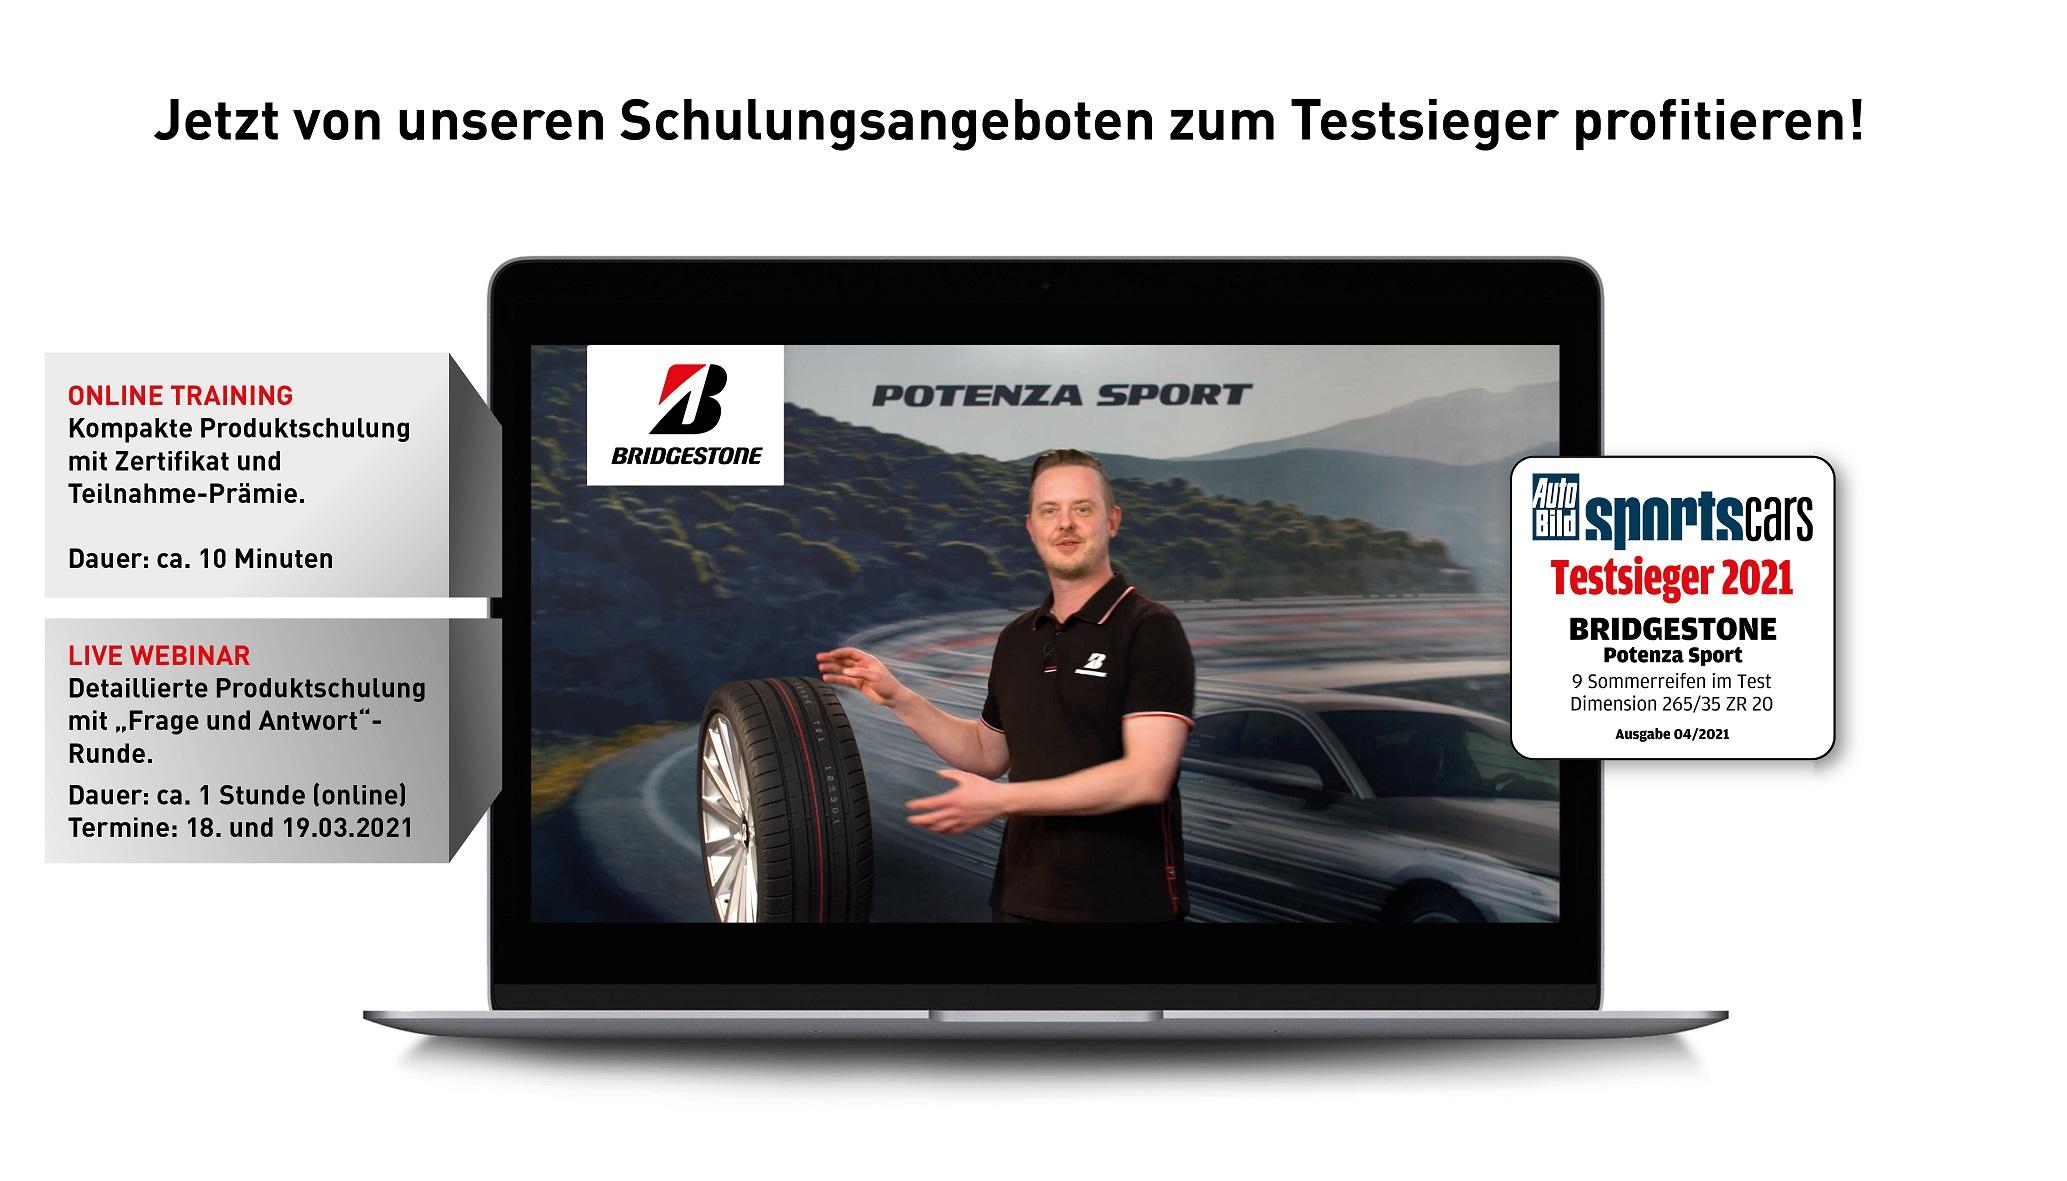 Bridgestone Online-Trainings und Webinare